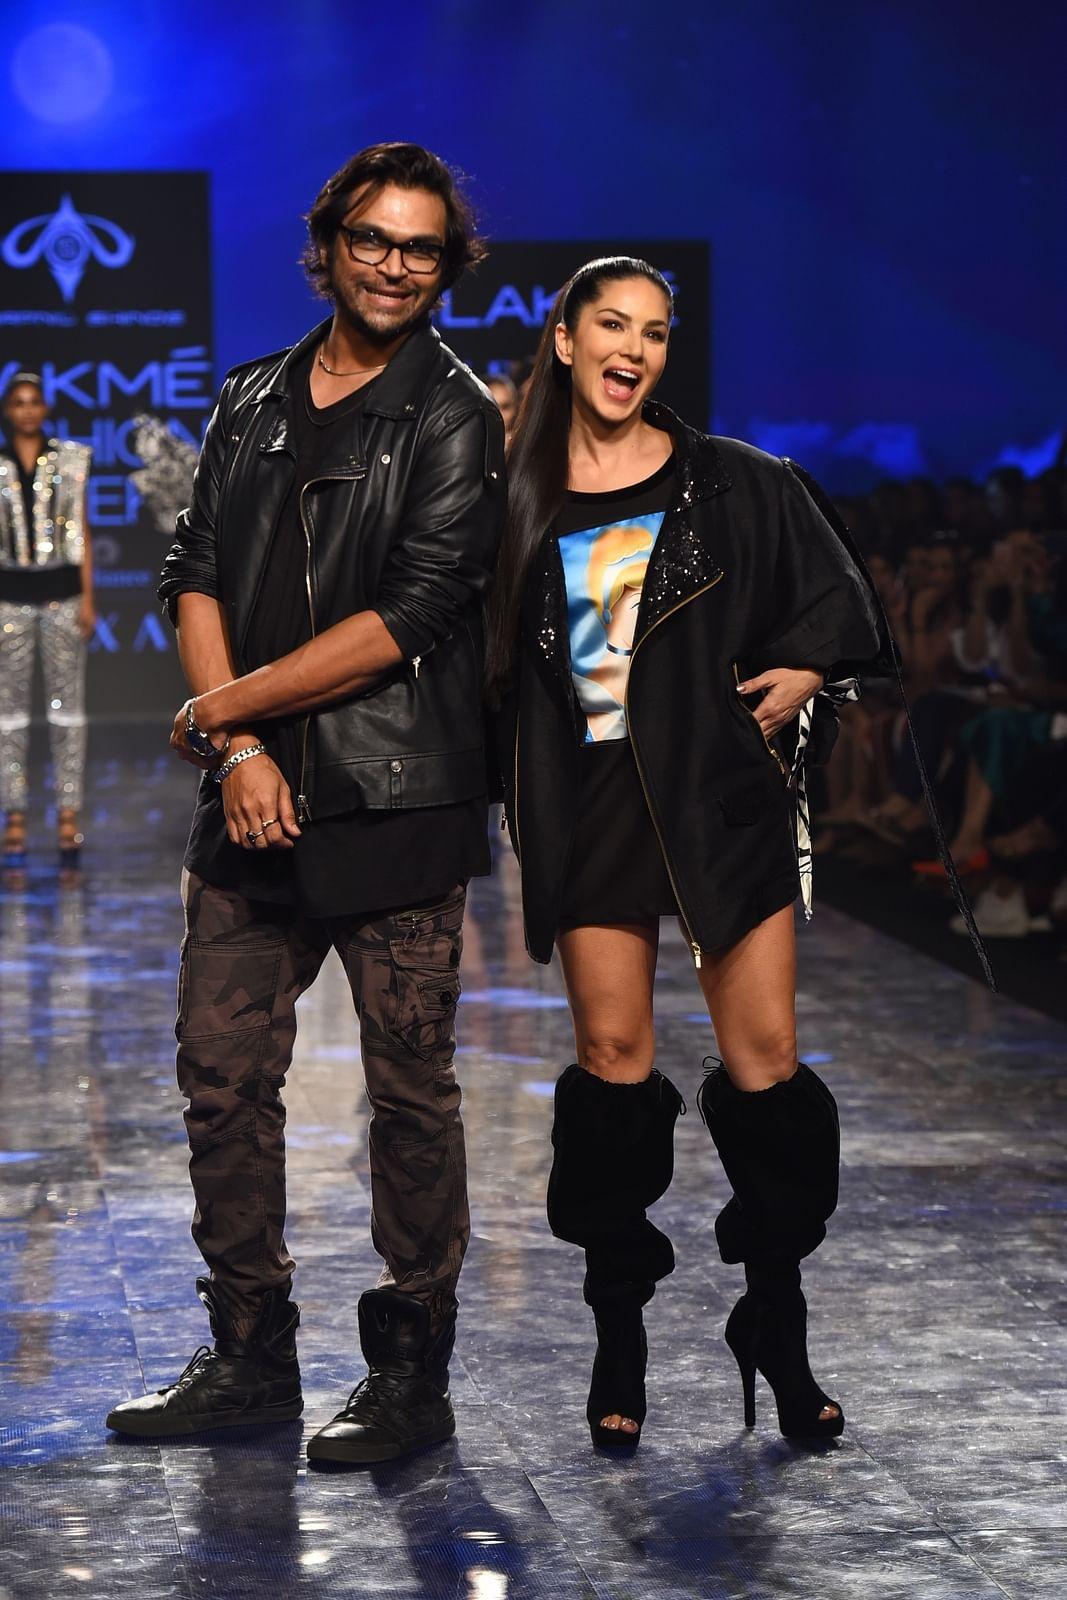 Swapnil Shinde with Sunny Leone